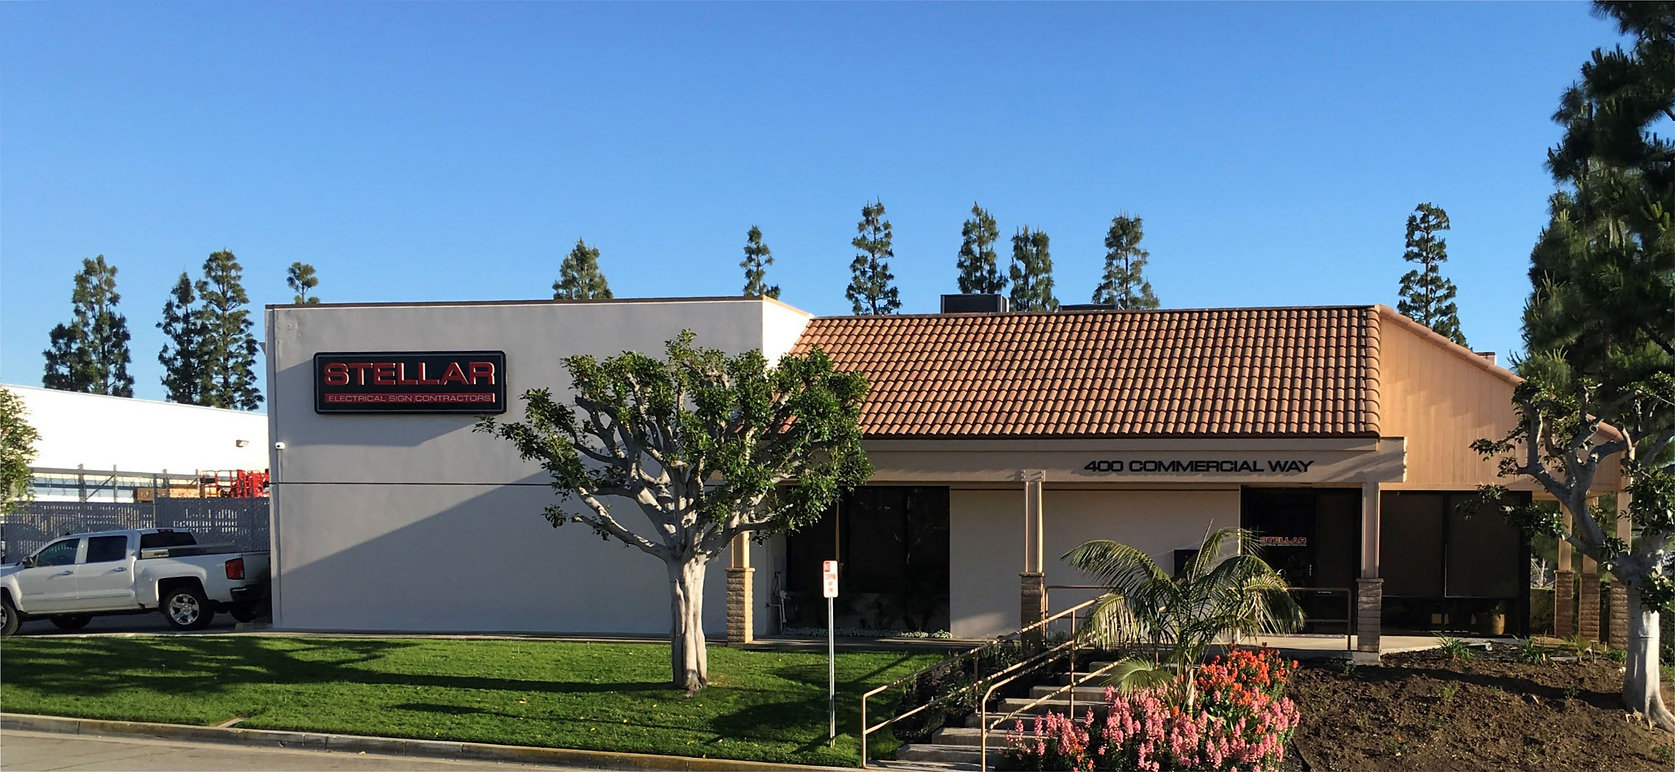 Stellar Installations Headquarters Corp.